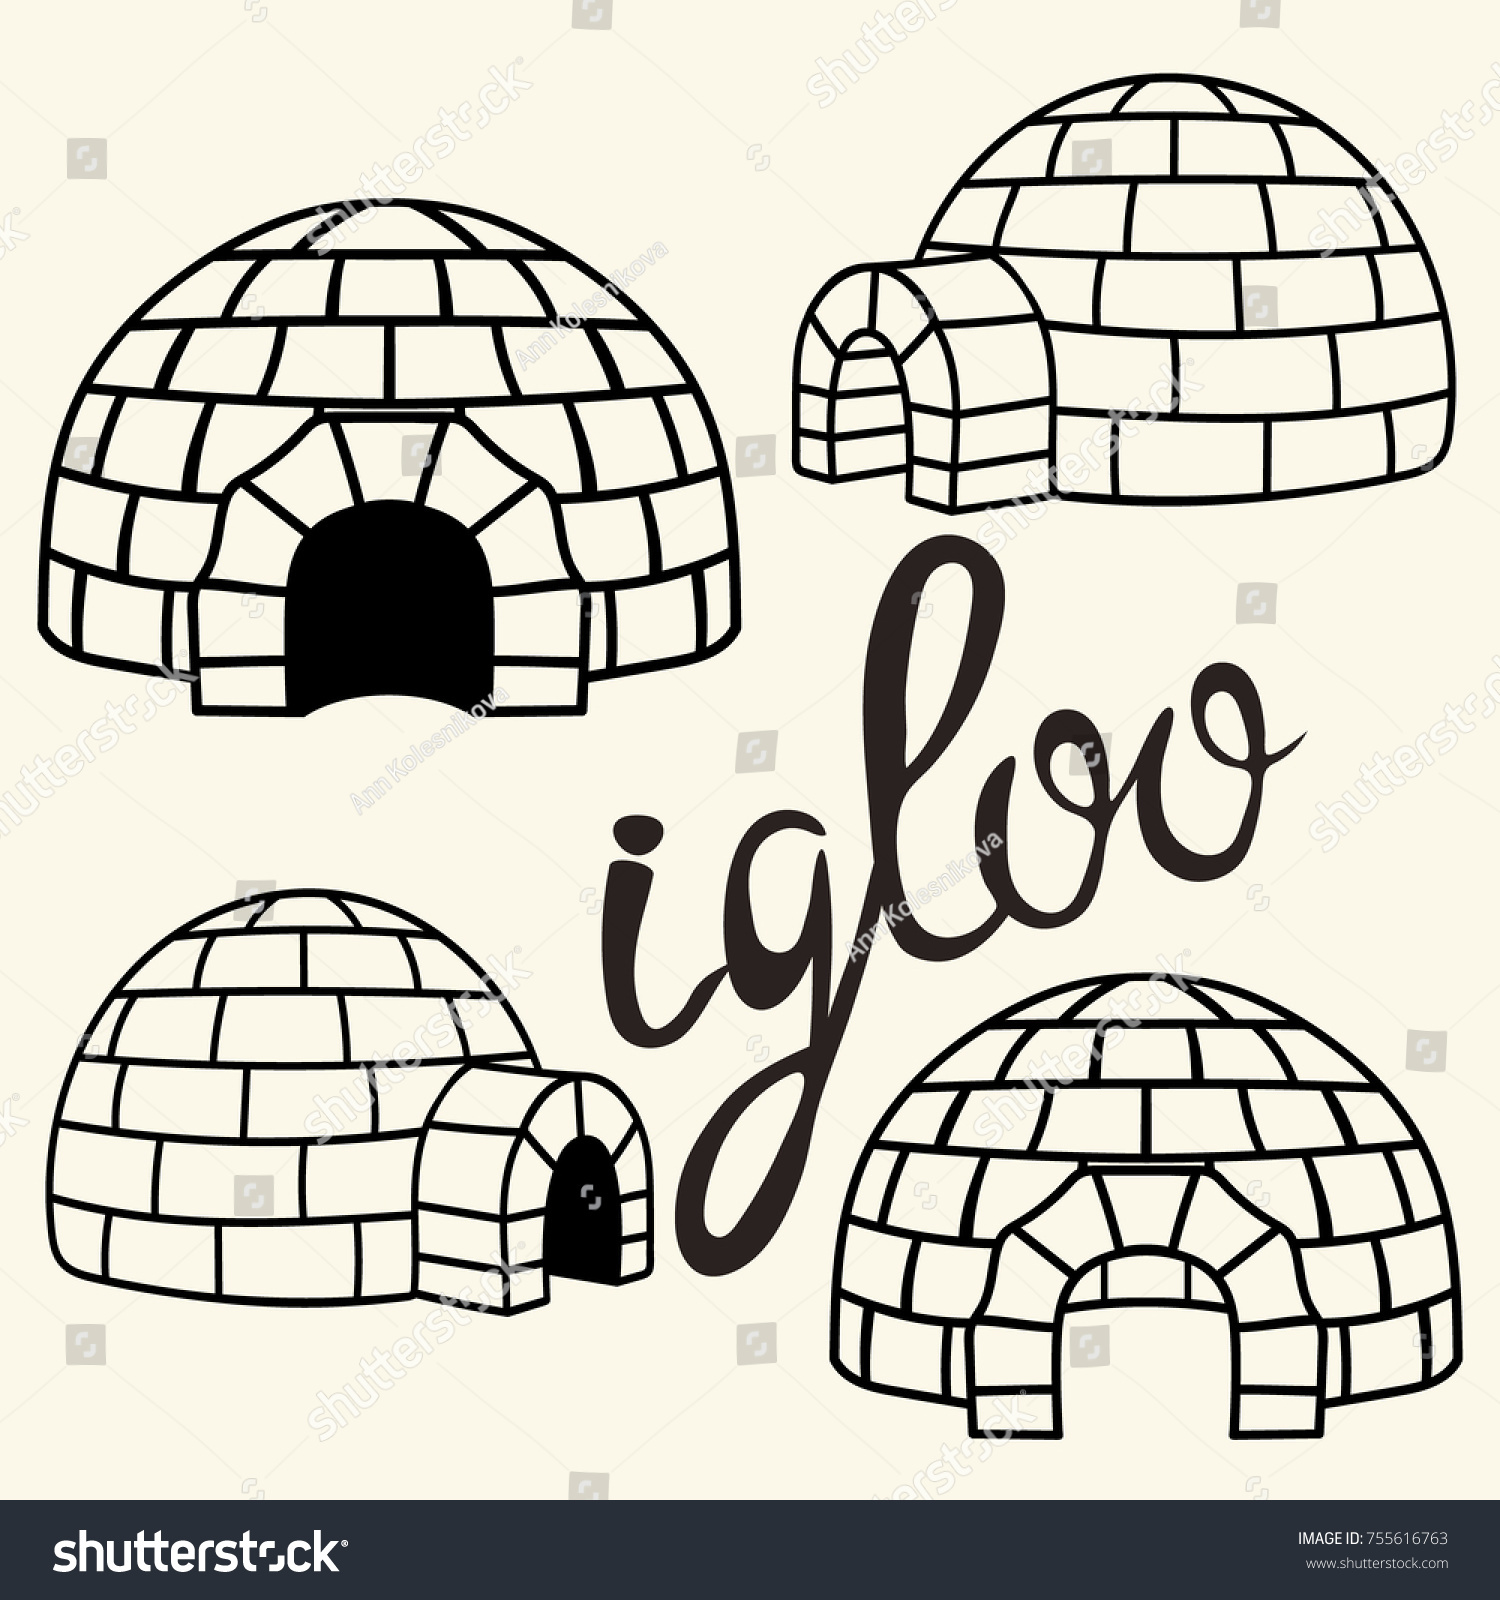 Ice House Igloo Set Vector Simple Imagem Vetorial De Banco 755616763    Shutterstock